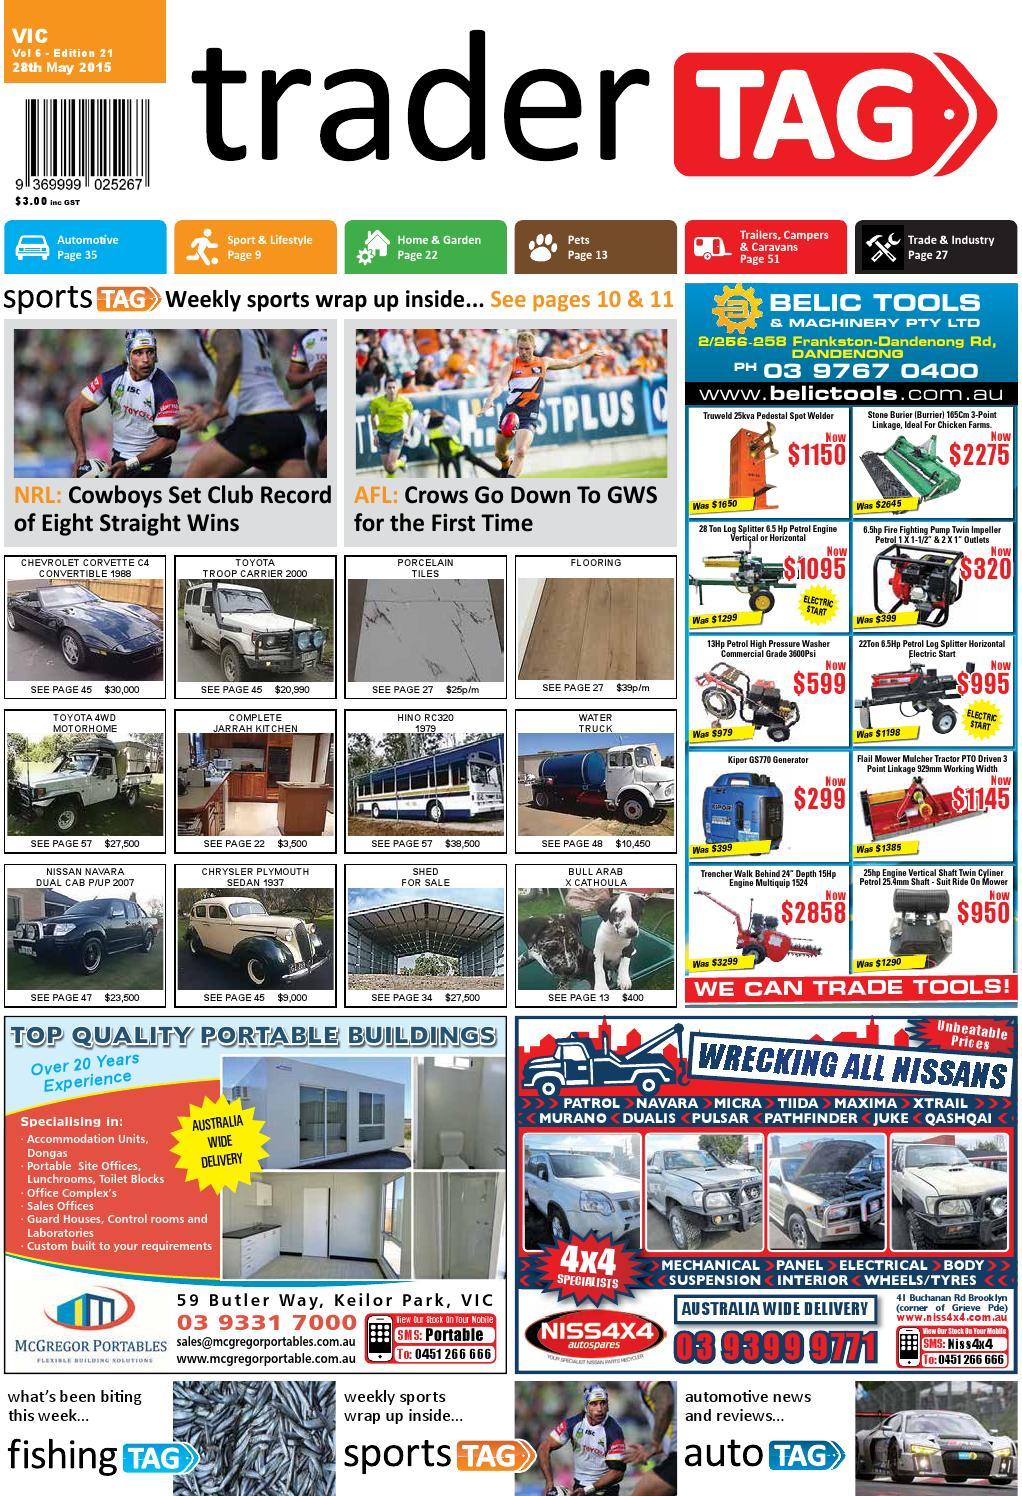 TraderTAG - Victoria - Edition 21 - 2015 by TraderTAG Design - issuu 7c437bae77